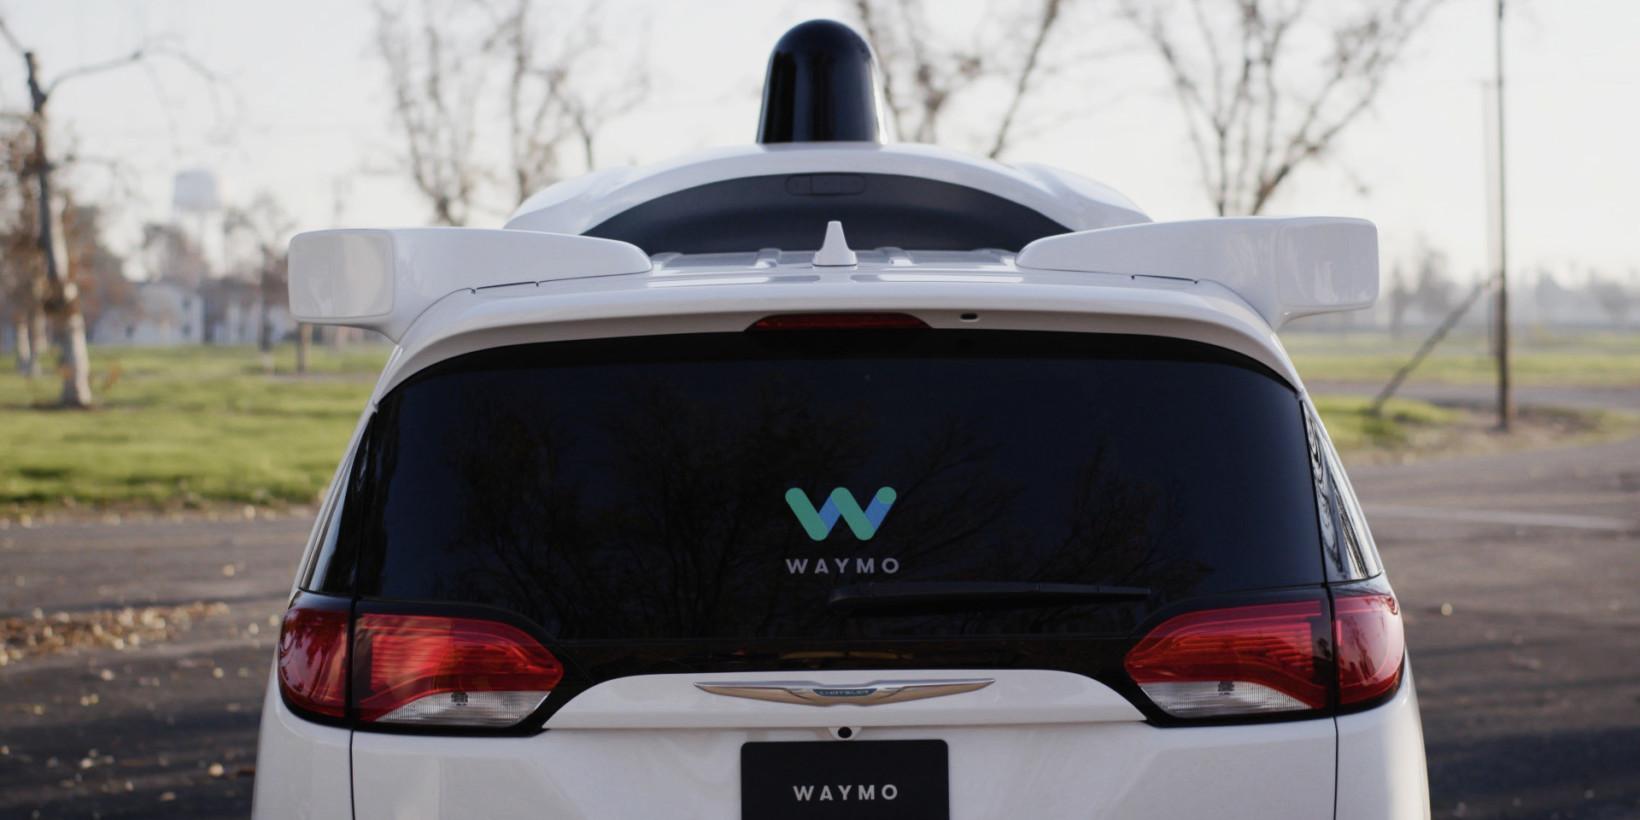 Waymo is testing 'thousands' more driverless minivans across America